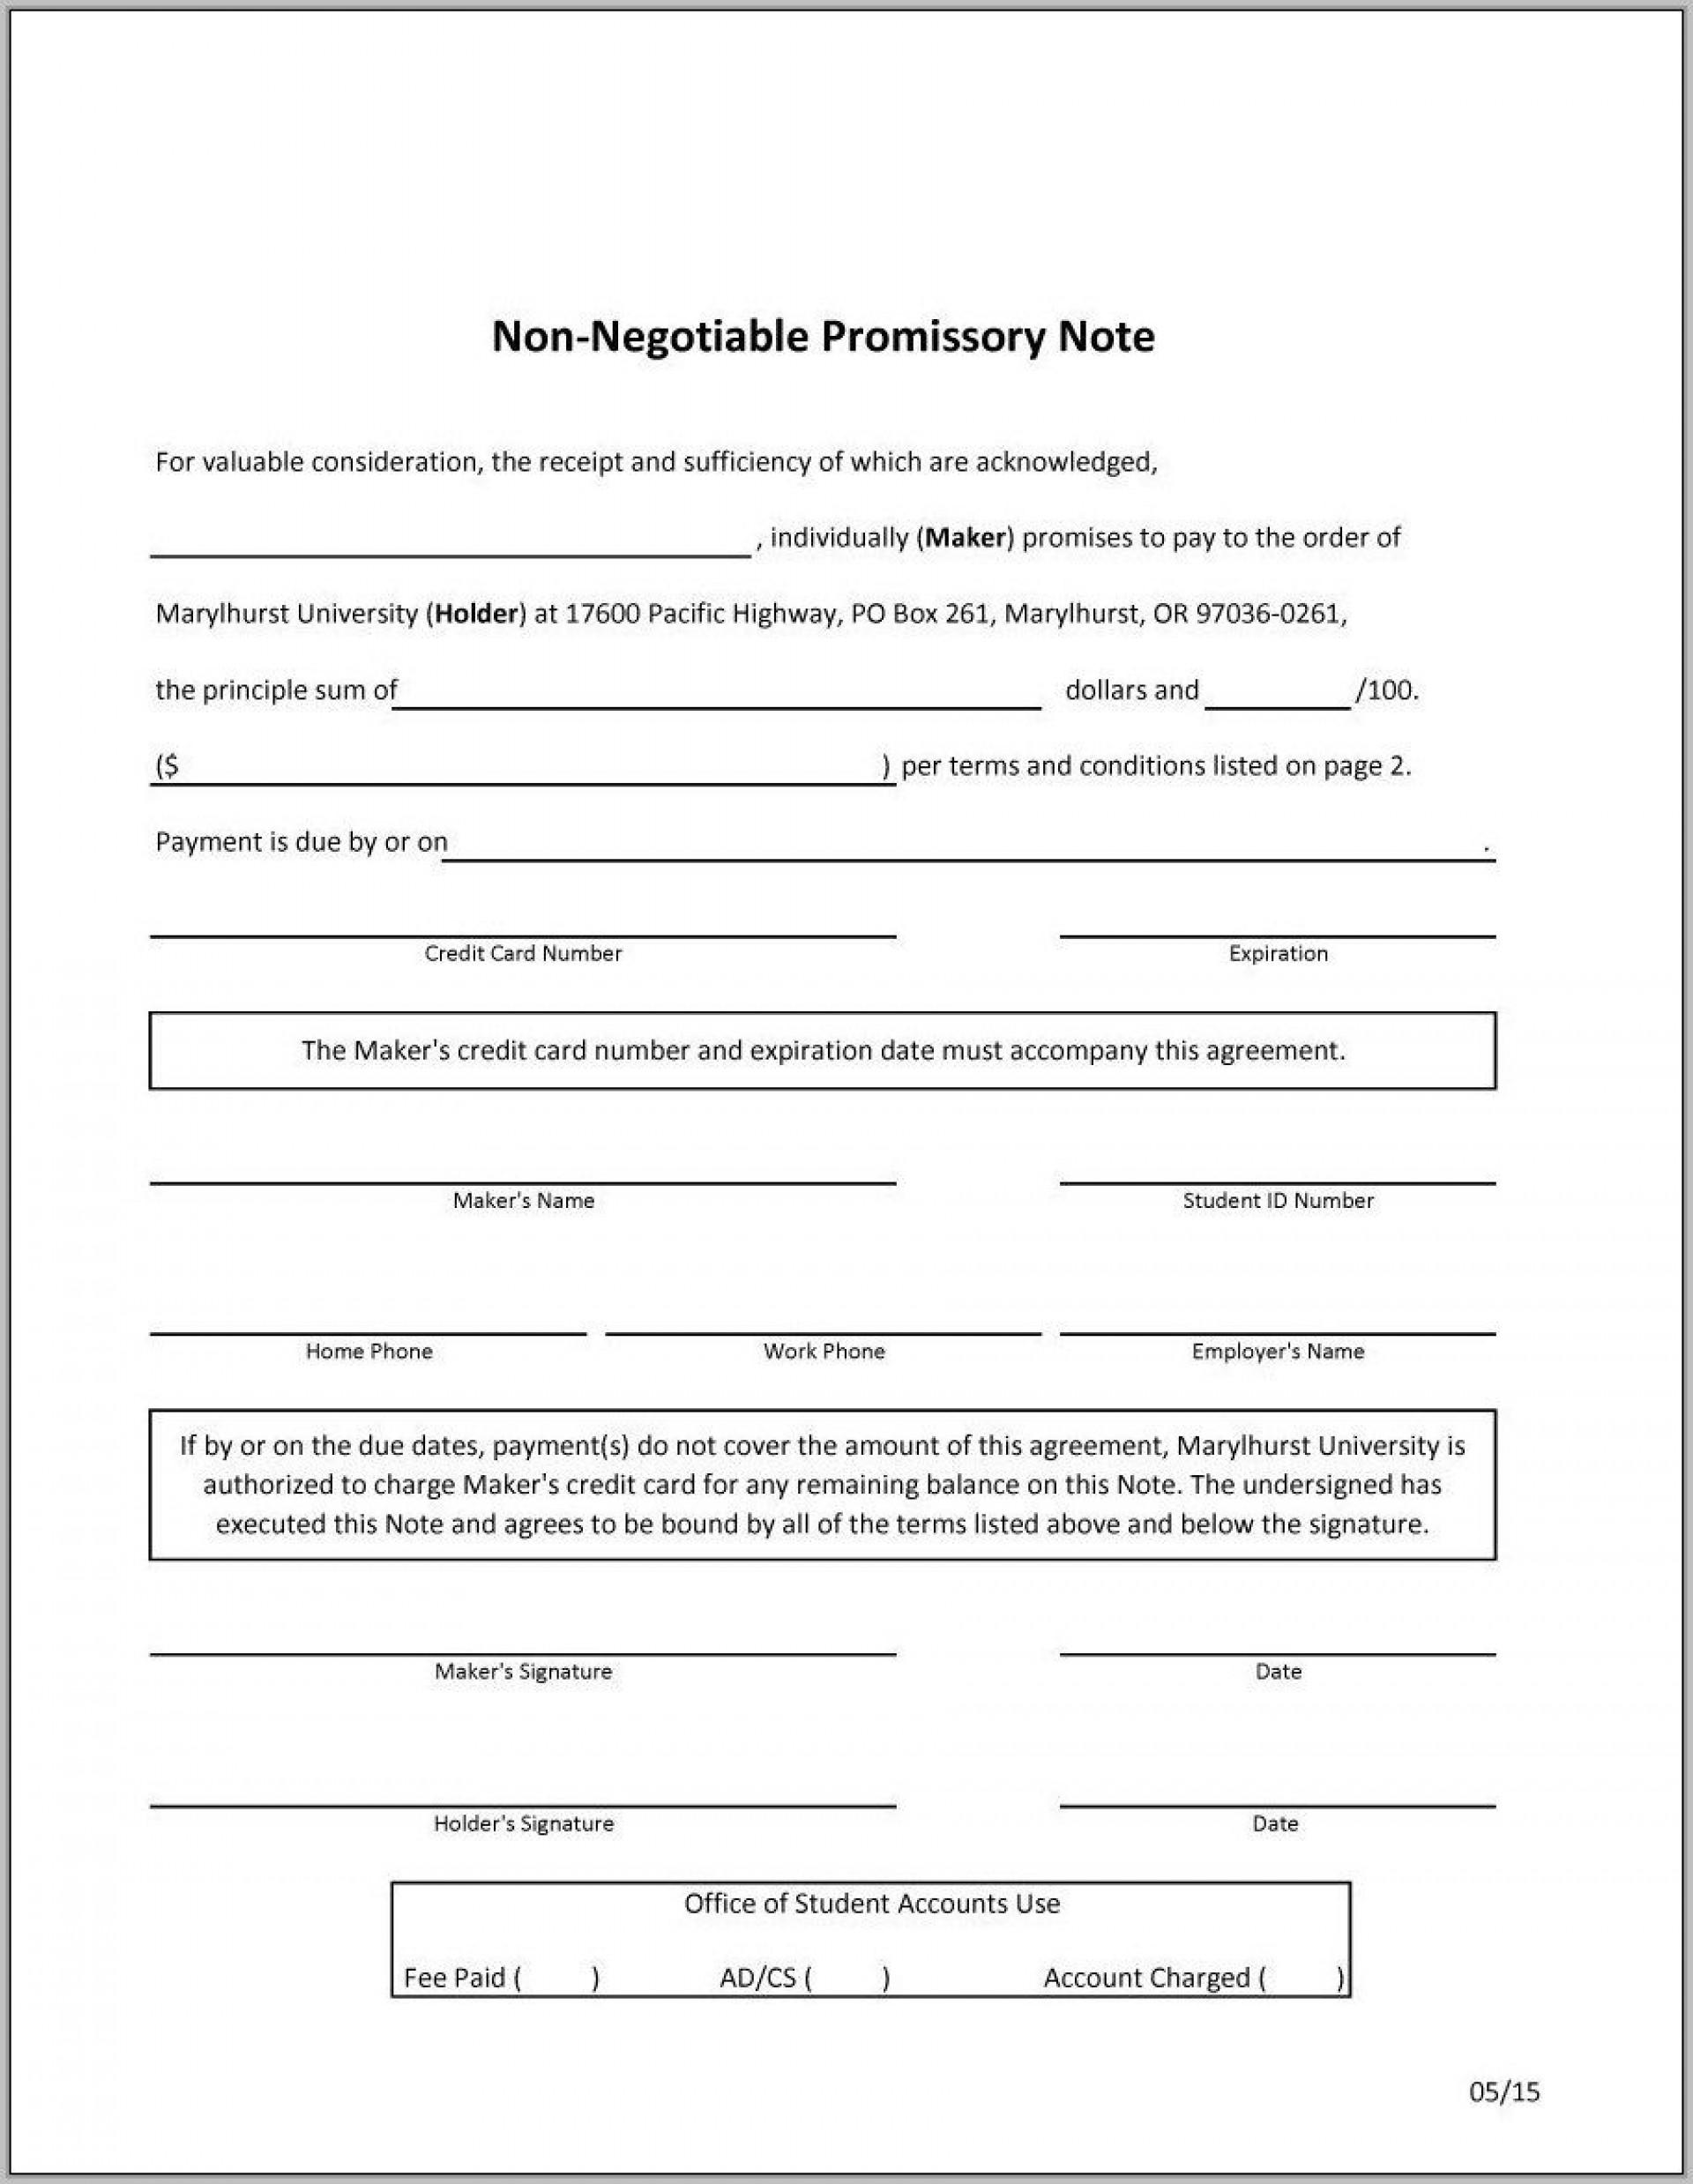 002 Impressive Promissory Note Template Free Image  Pdf Florida Blank Form1920